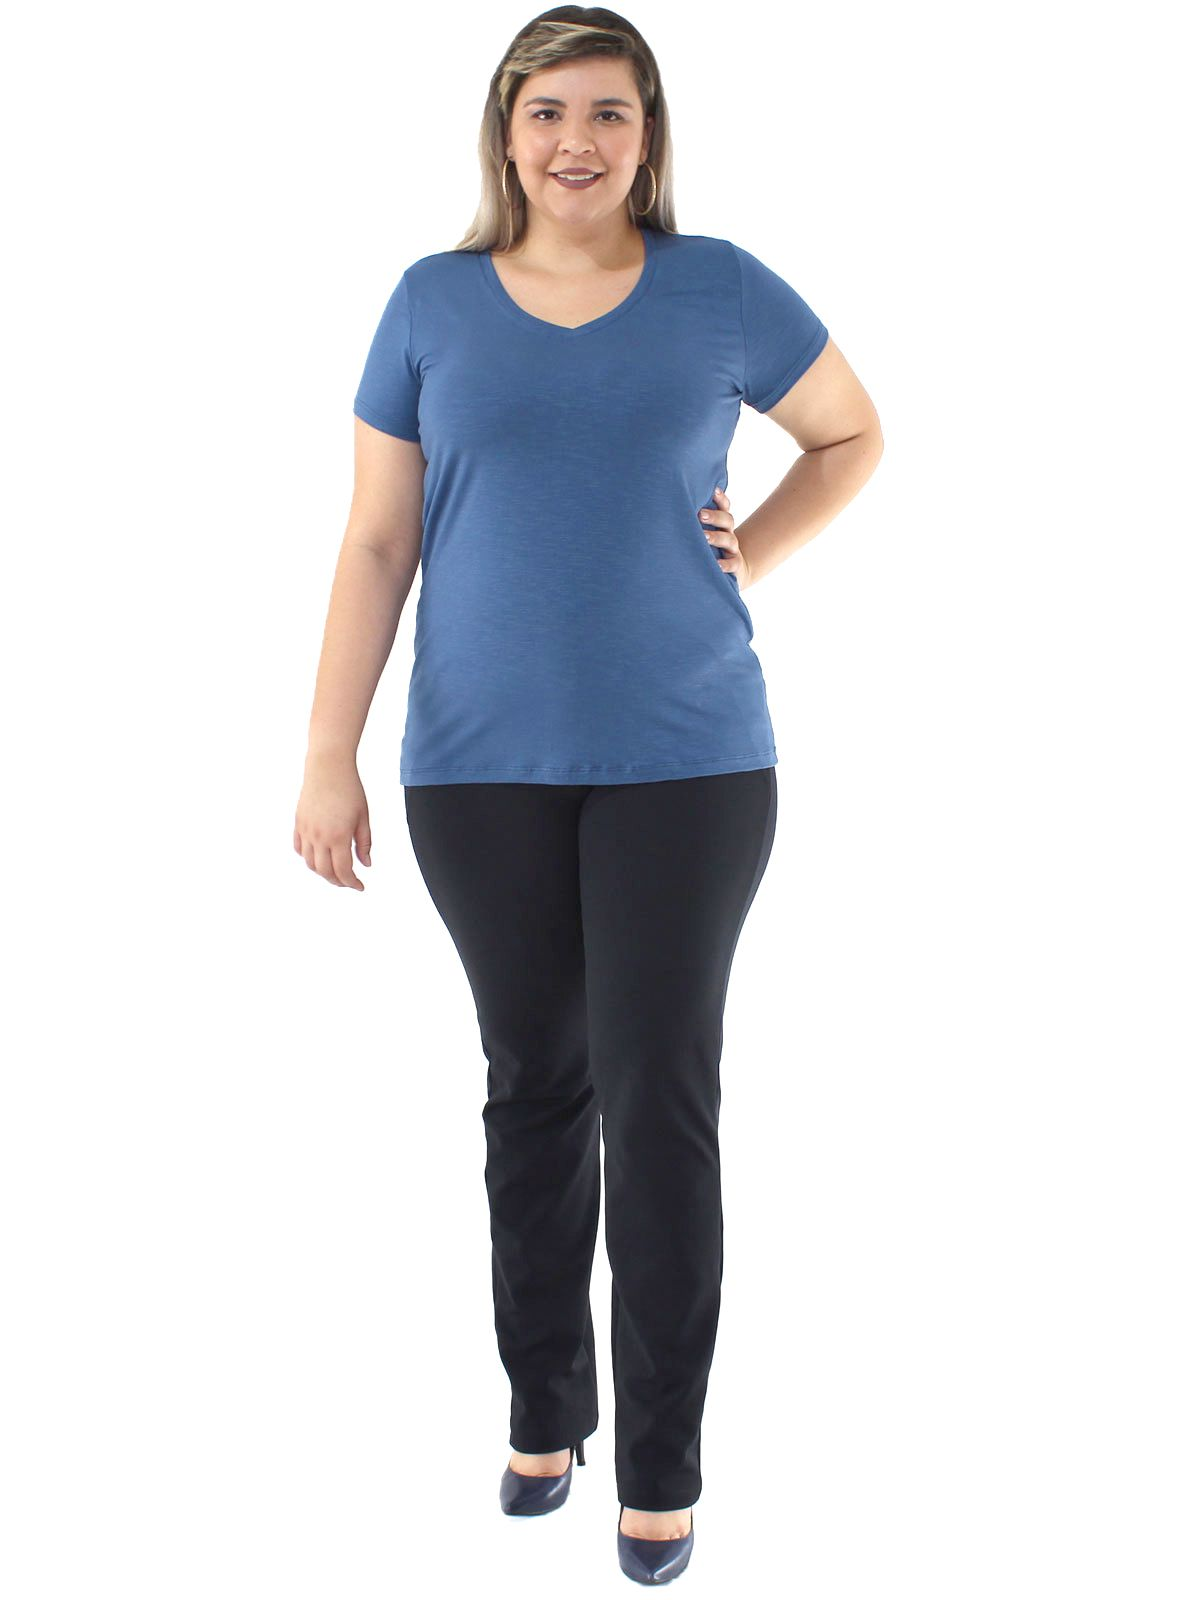 Blusa Plus Size KTS Visco Flame Decote V. Azul Jeans